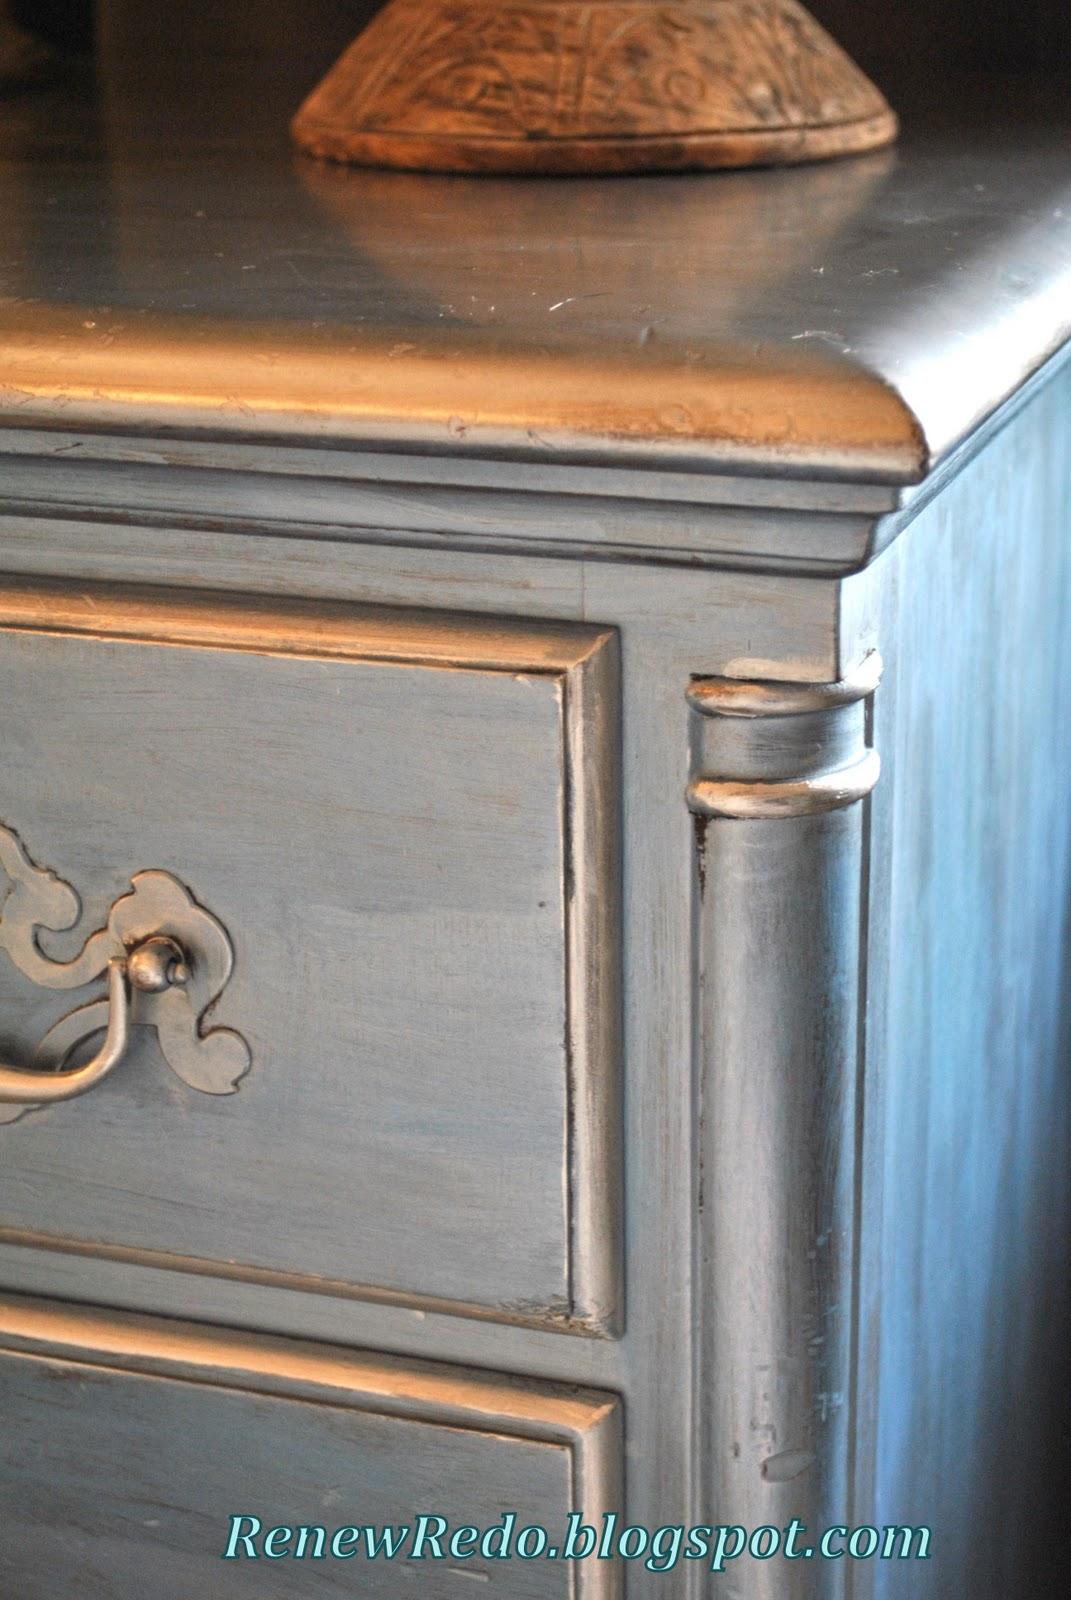 Renew Redo Pearl Blue And Silver Leaf Desk Redo Rub